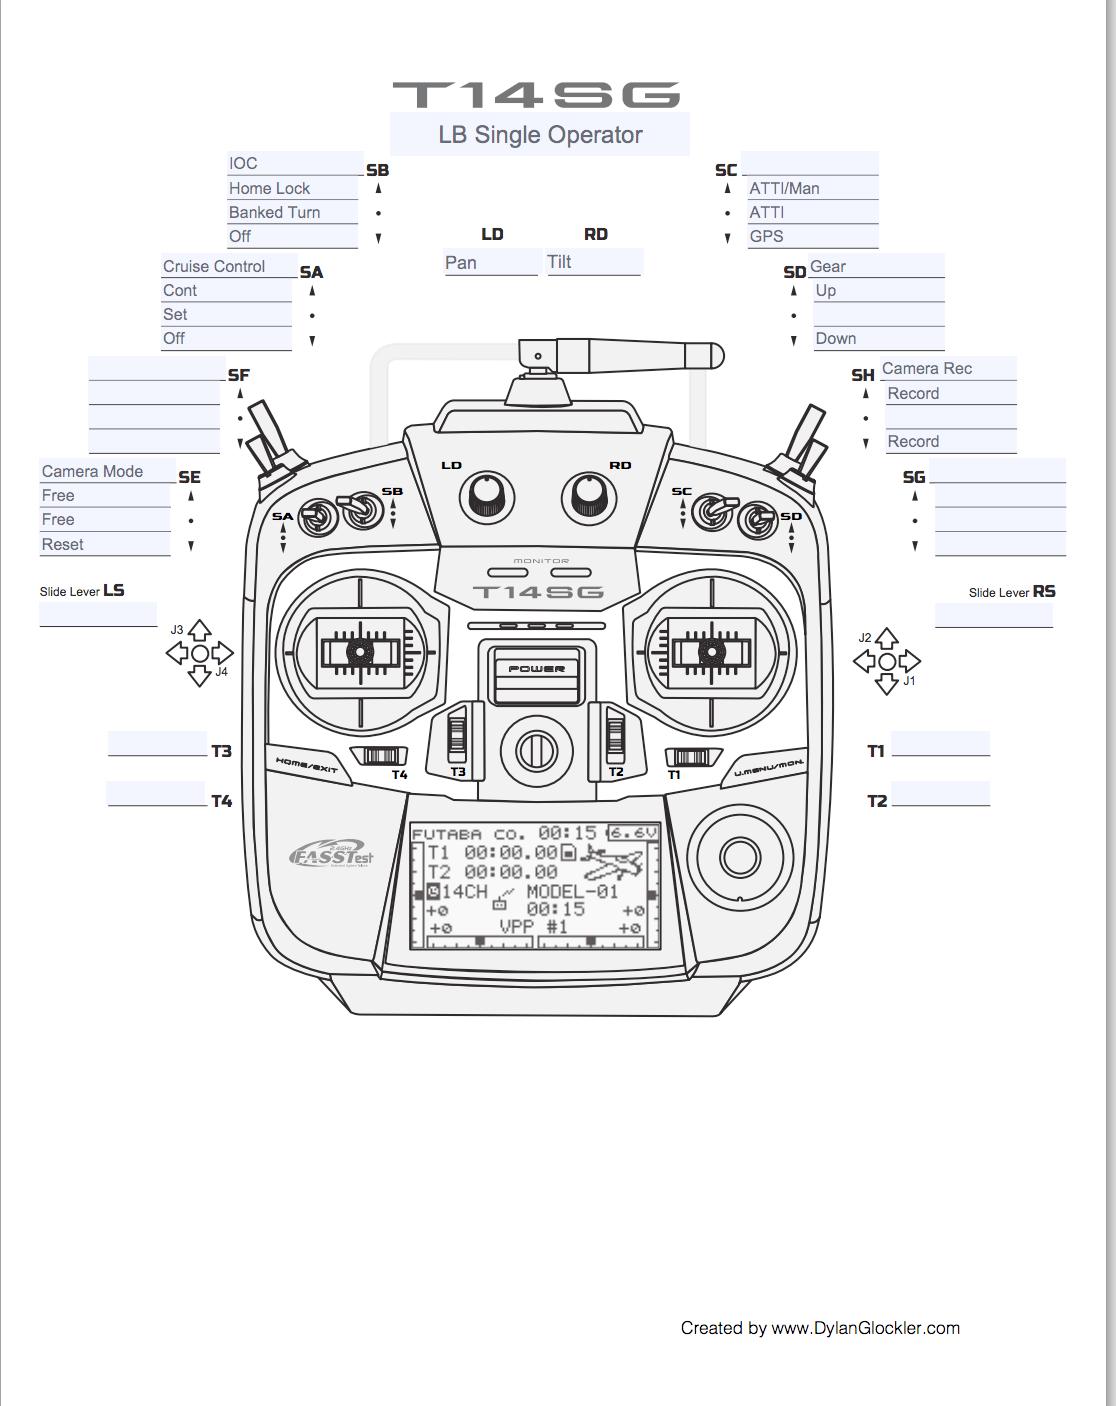 Lightbridge futaba 14 sg settings and setup dji wiring a homeline service panel futaba dji wiring diagram